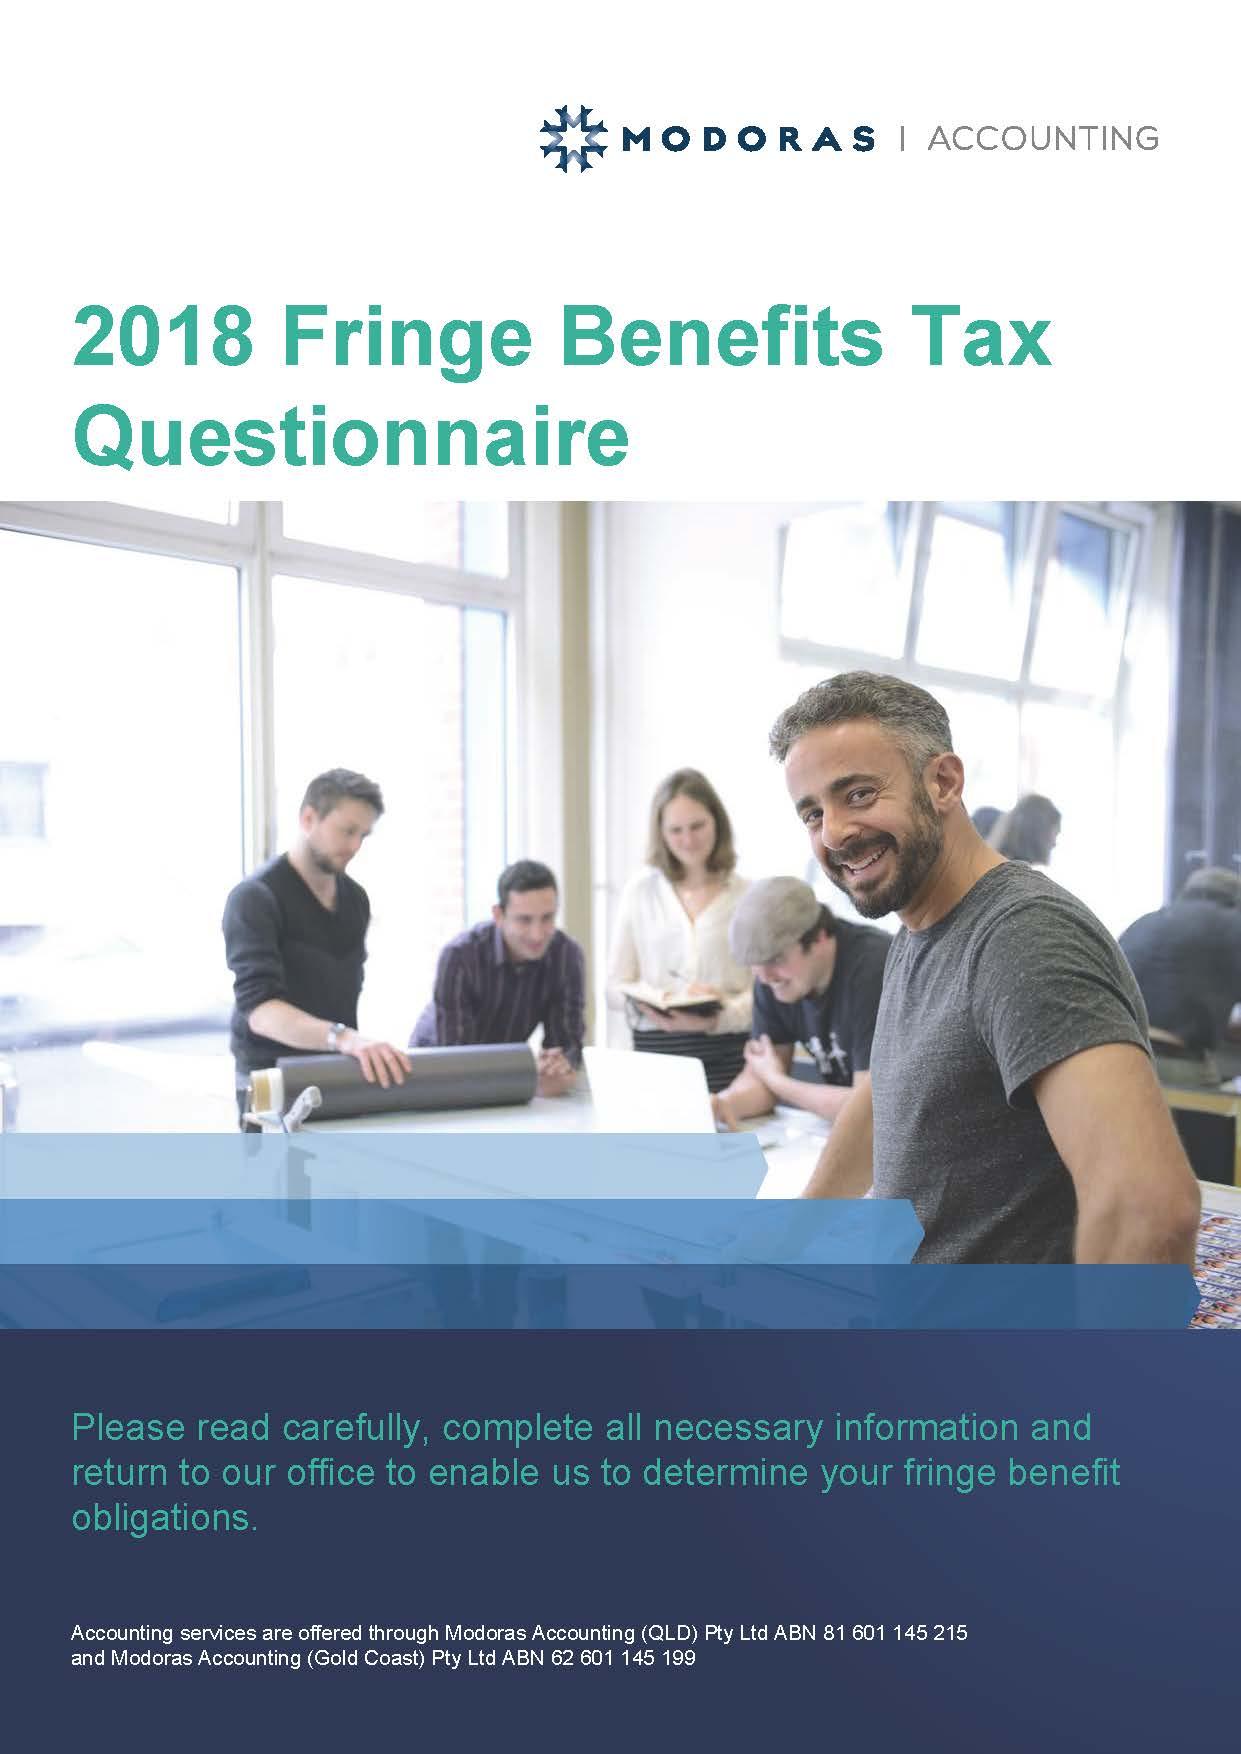 Fringe Benefits Tax Questionnaire